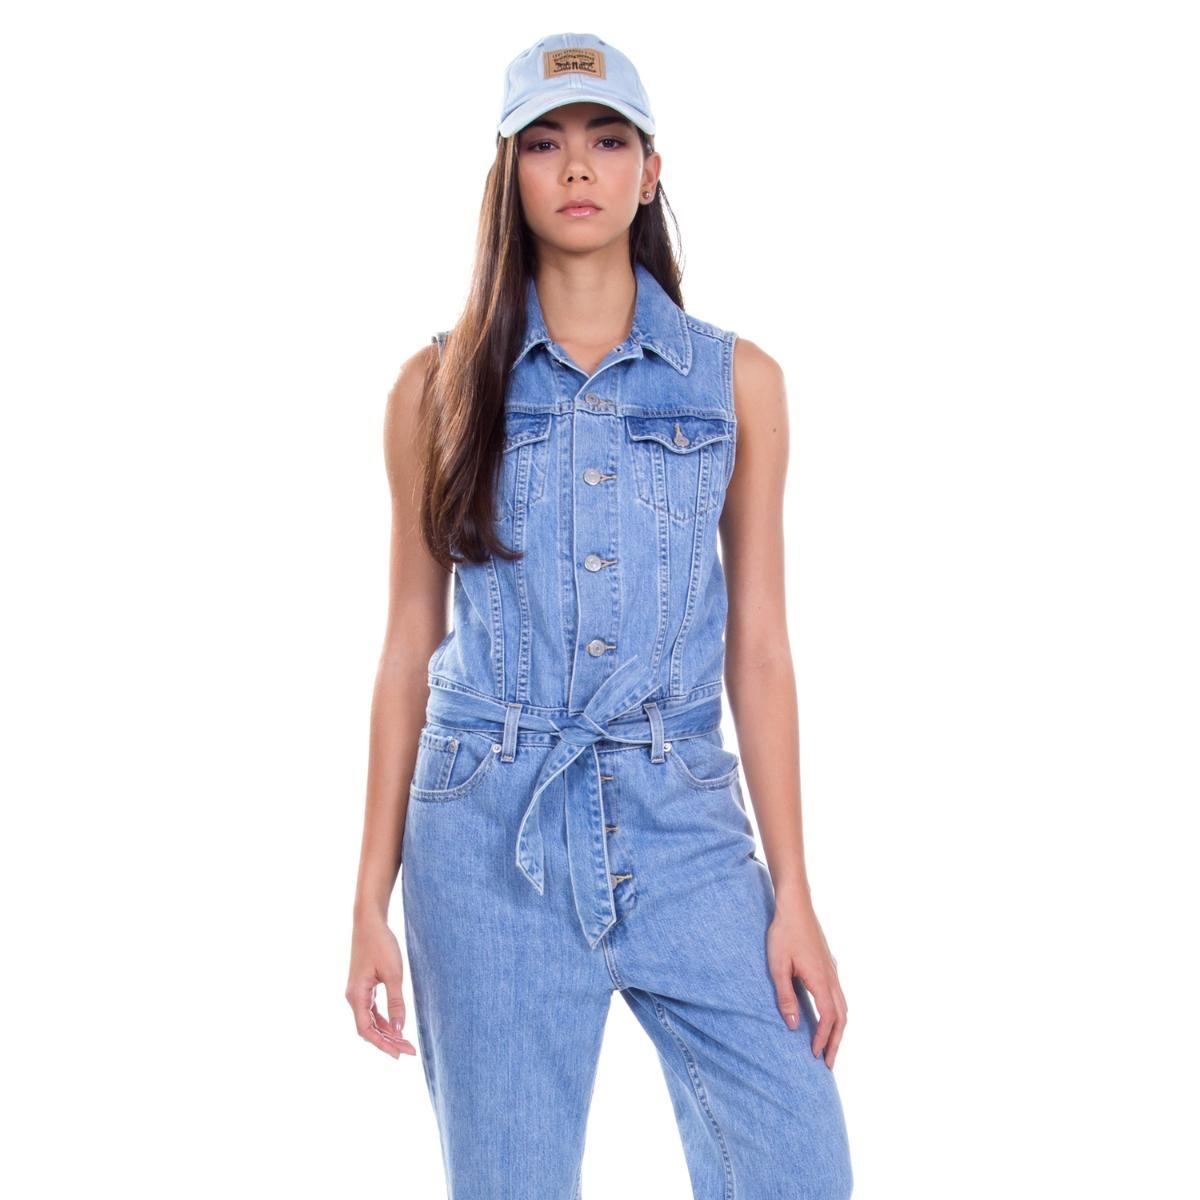 macacão levis feminino jeans taper jumpsuit azul médio. Carregando zoom. 130d2f62e62